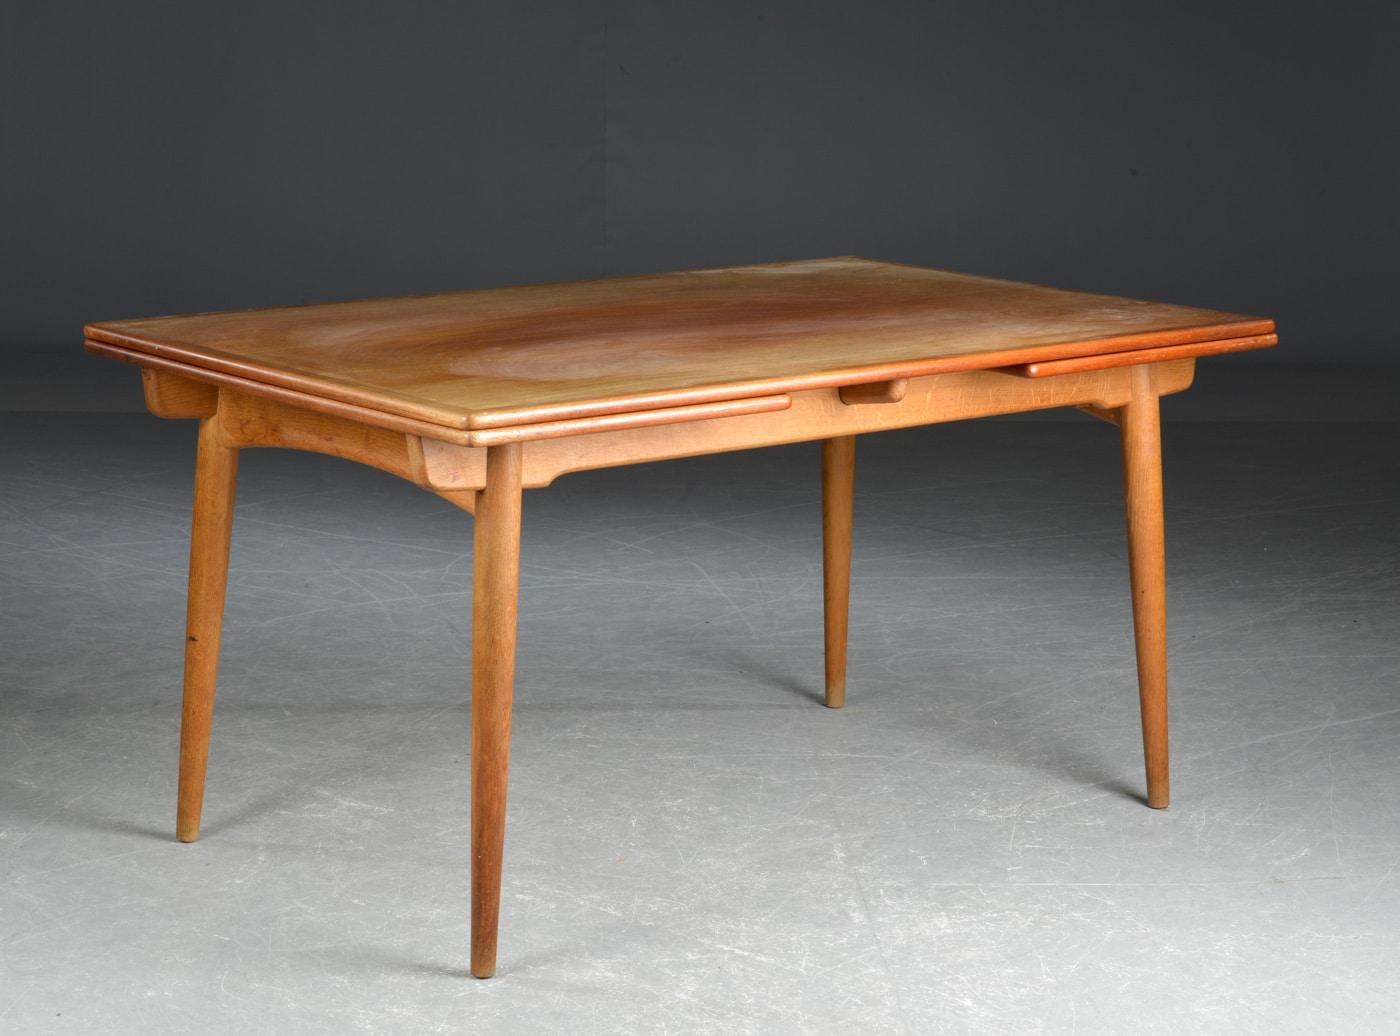 Hans J. Wegener - spisebord med butterfly udtræk